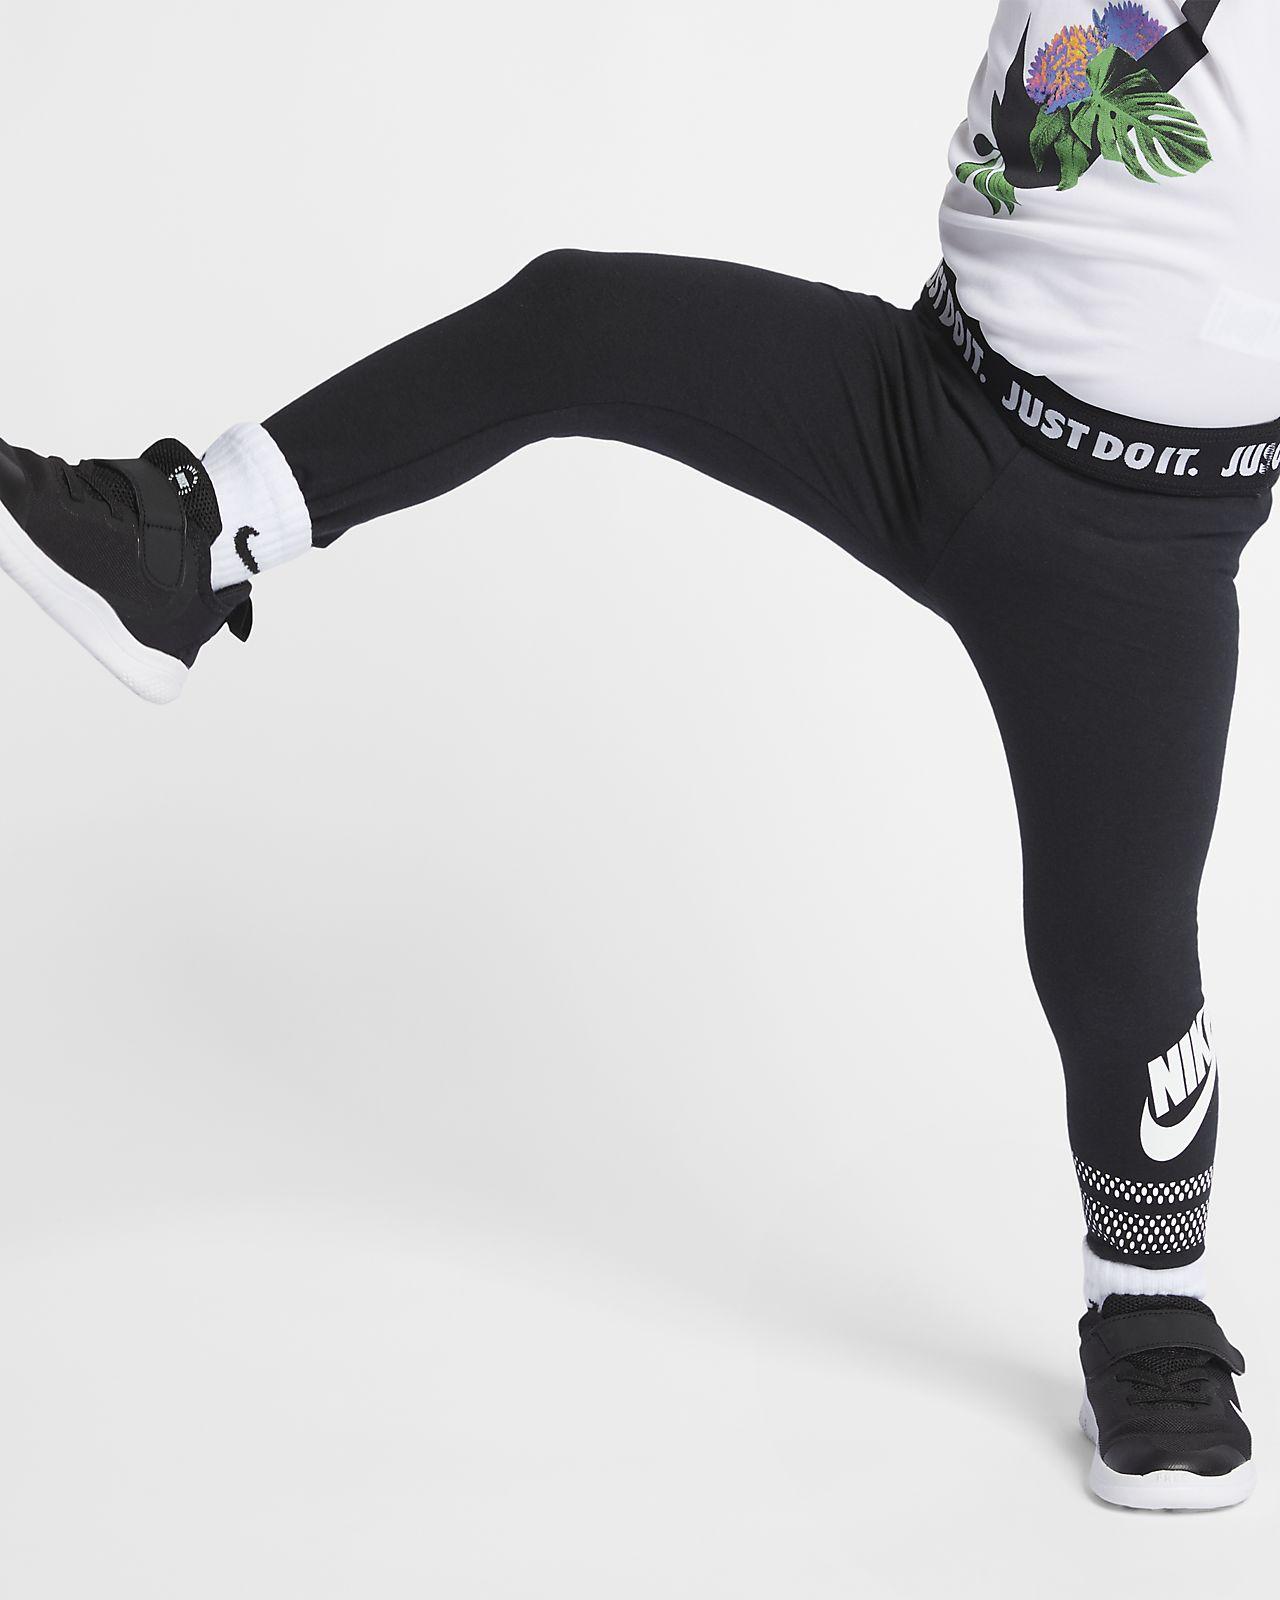 d0befda01970d Nike Sportswear Toddler Leggings. Nike.com GB